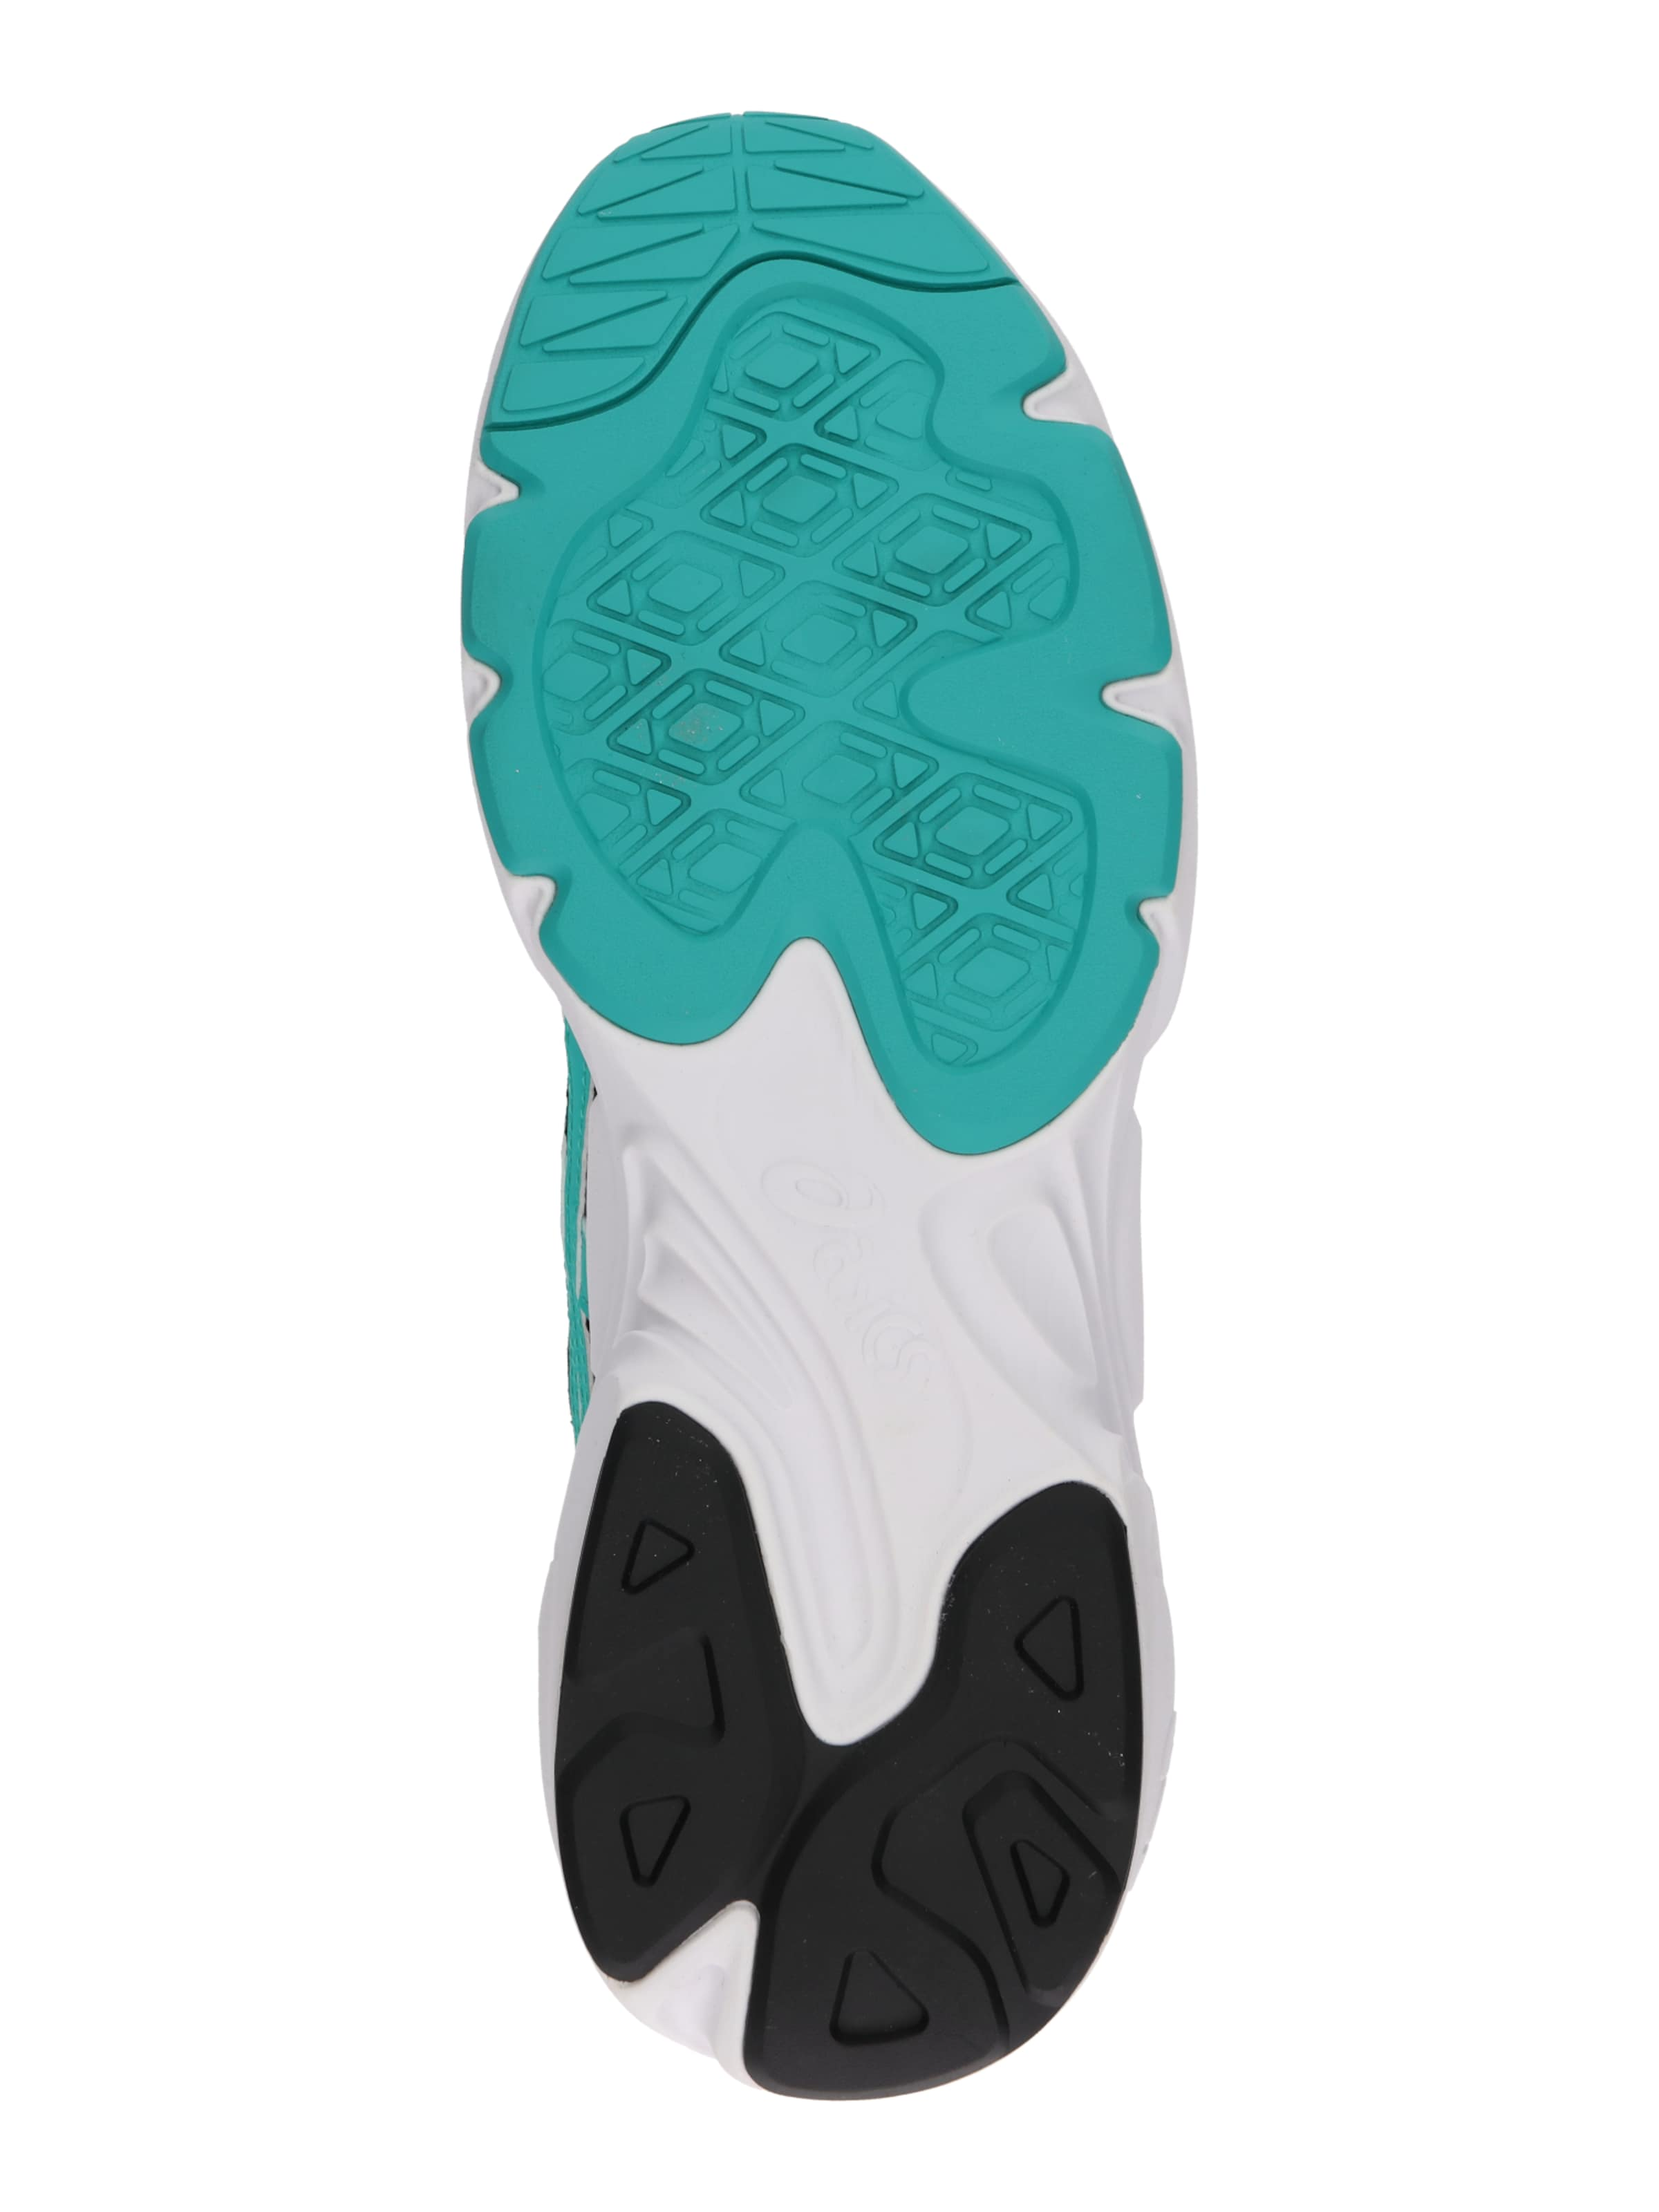 bondi' Sneaker 'gel GrünSchwarz Asics Tiger In yN0mPnwOv8